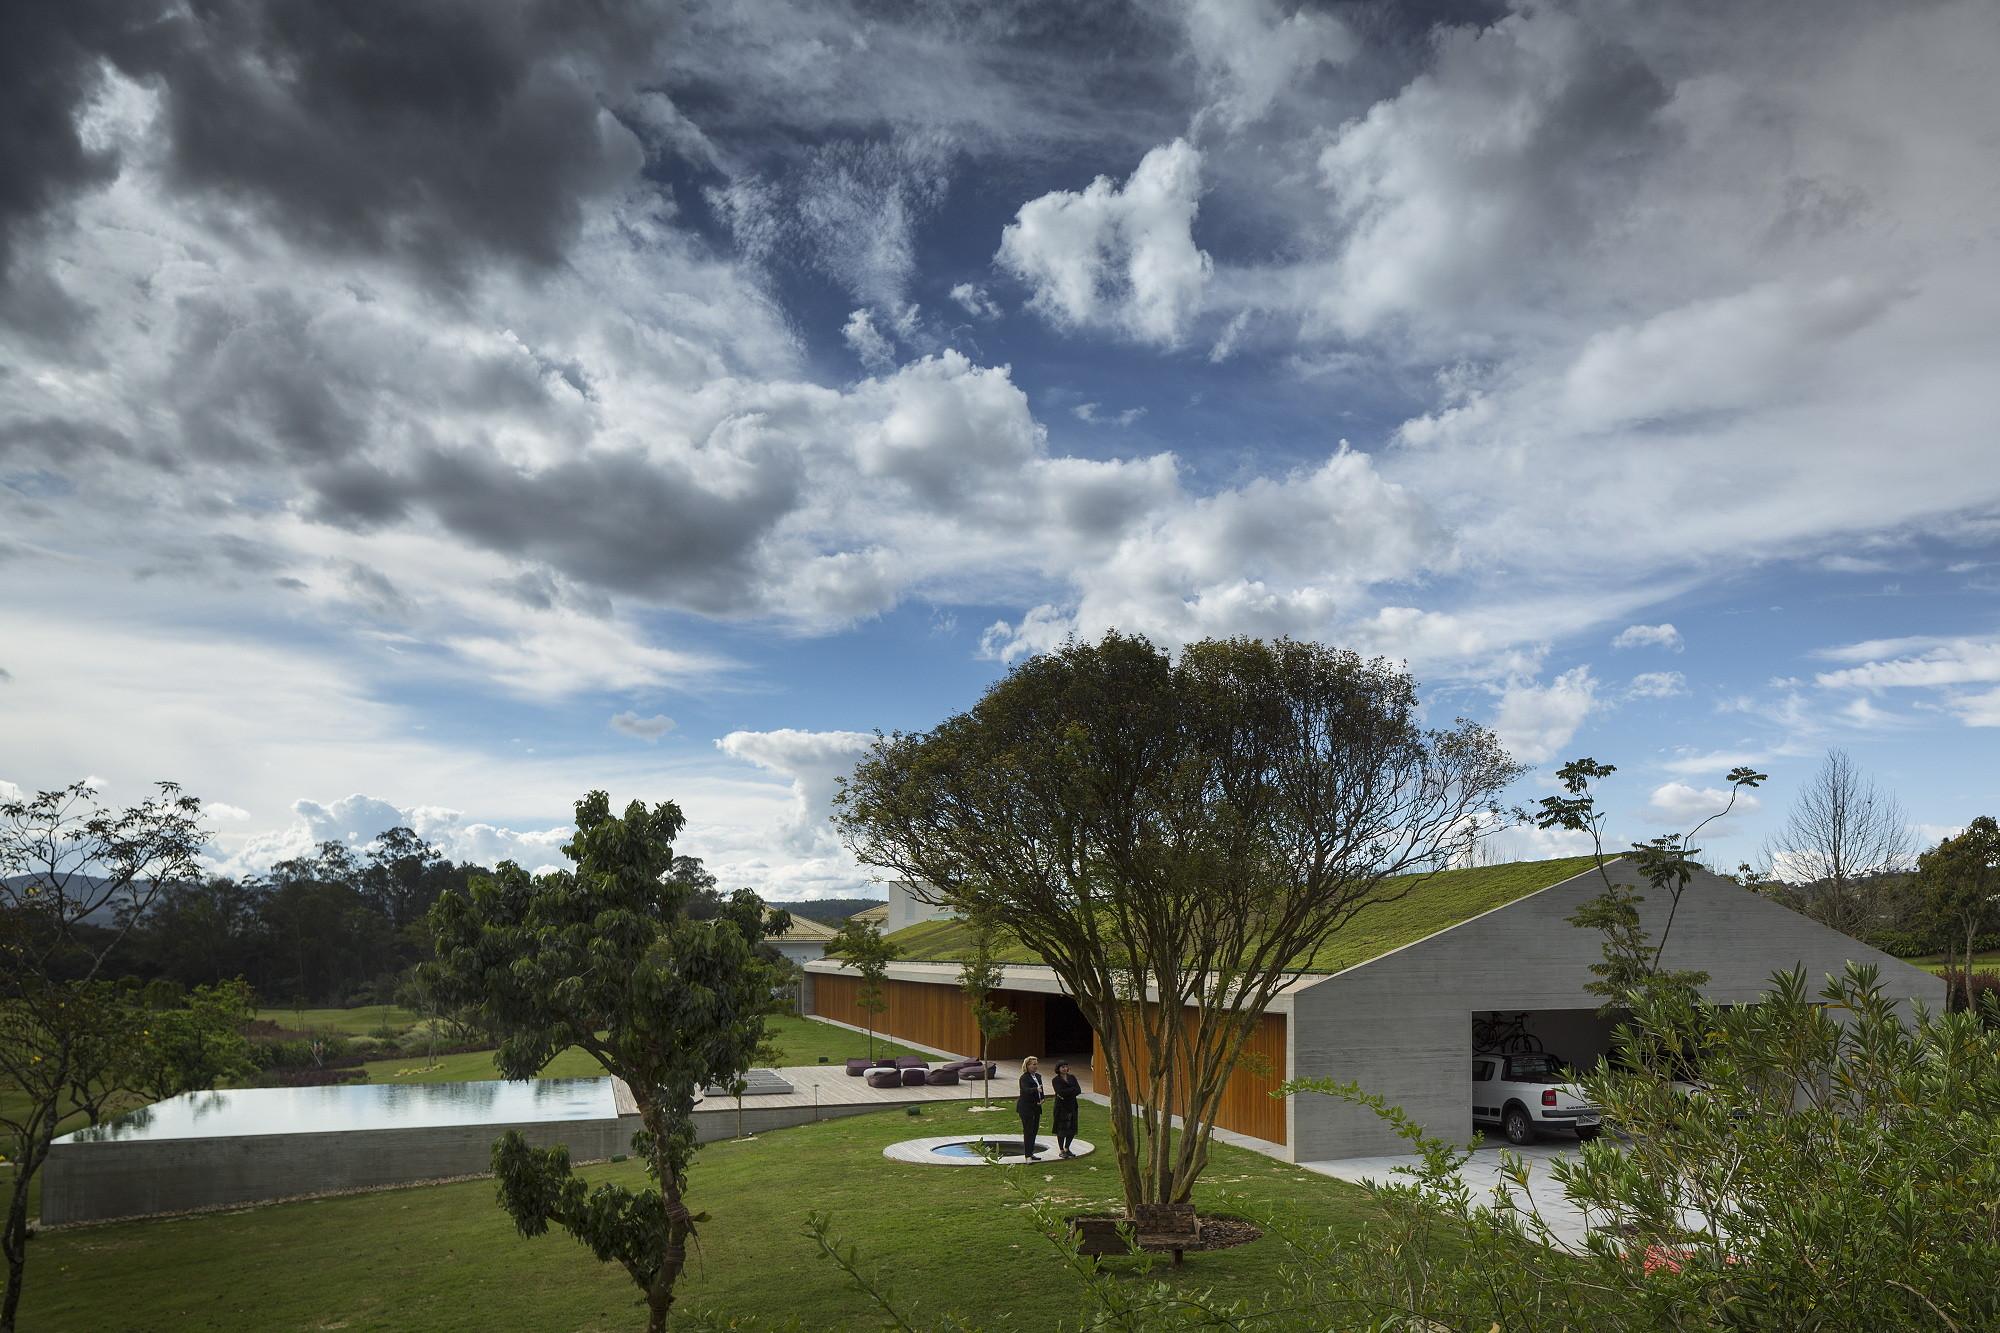 MM House / Studio MK27 - Marcio Kogan + Maria Cristina Motta, © FG+SG - Fernando Guerra